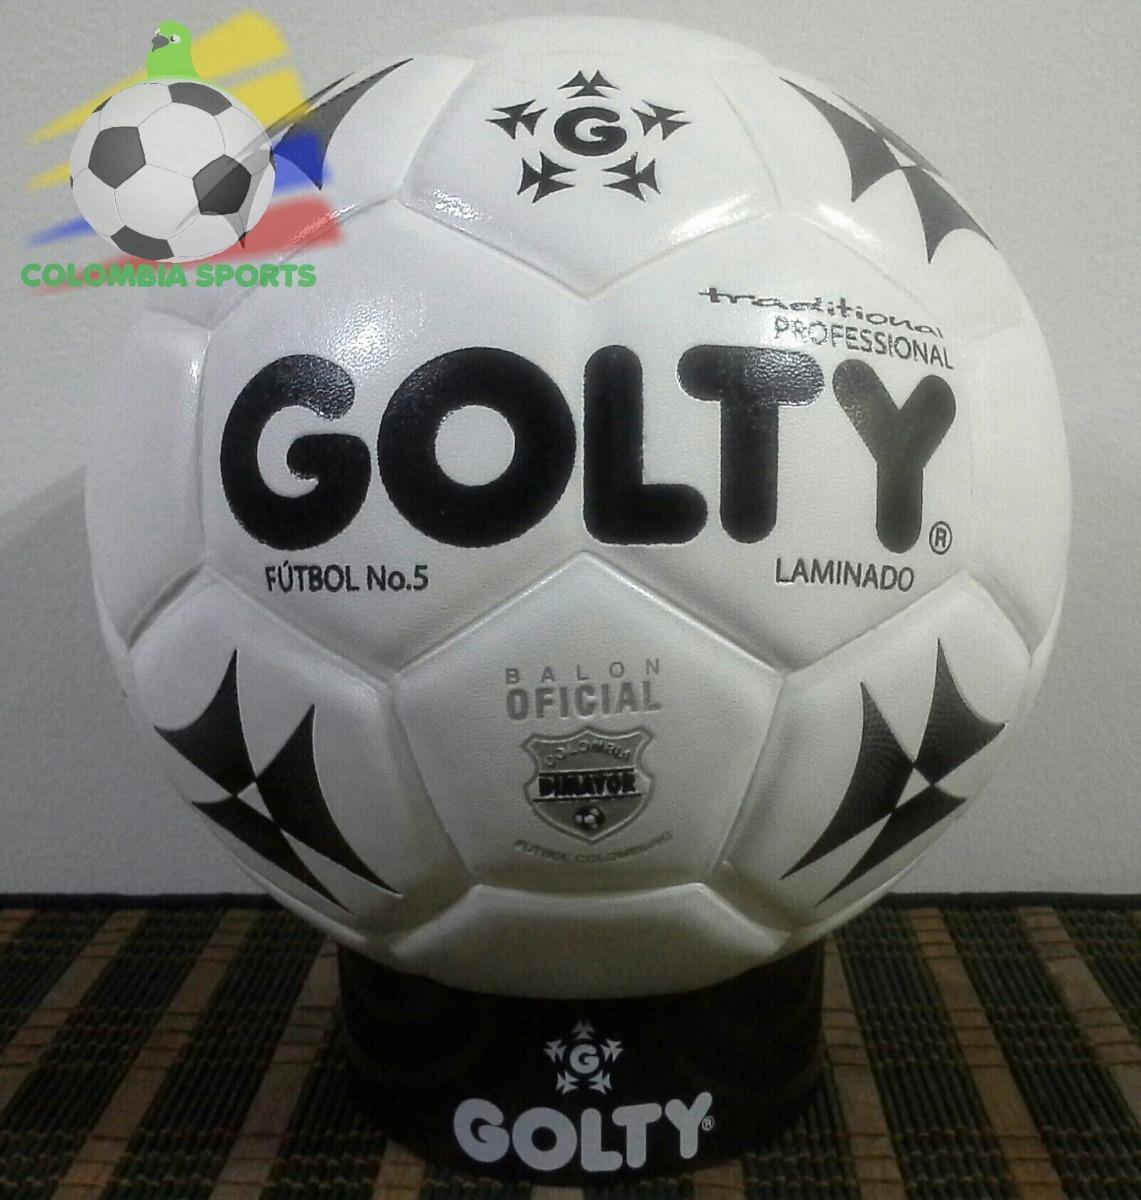 Golty Tradicional   5 Balon Futbol Oficial Dimayor Fpc -   85.000 en ... 1ece64b11efdb